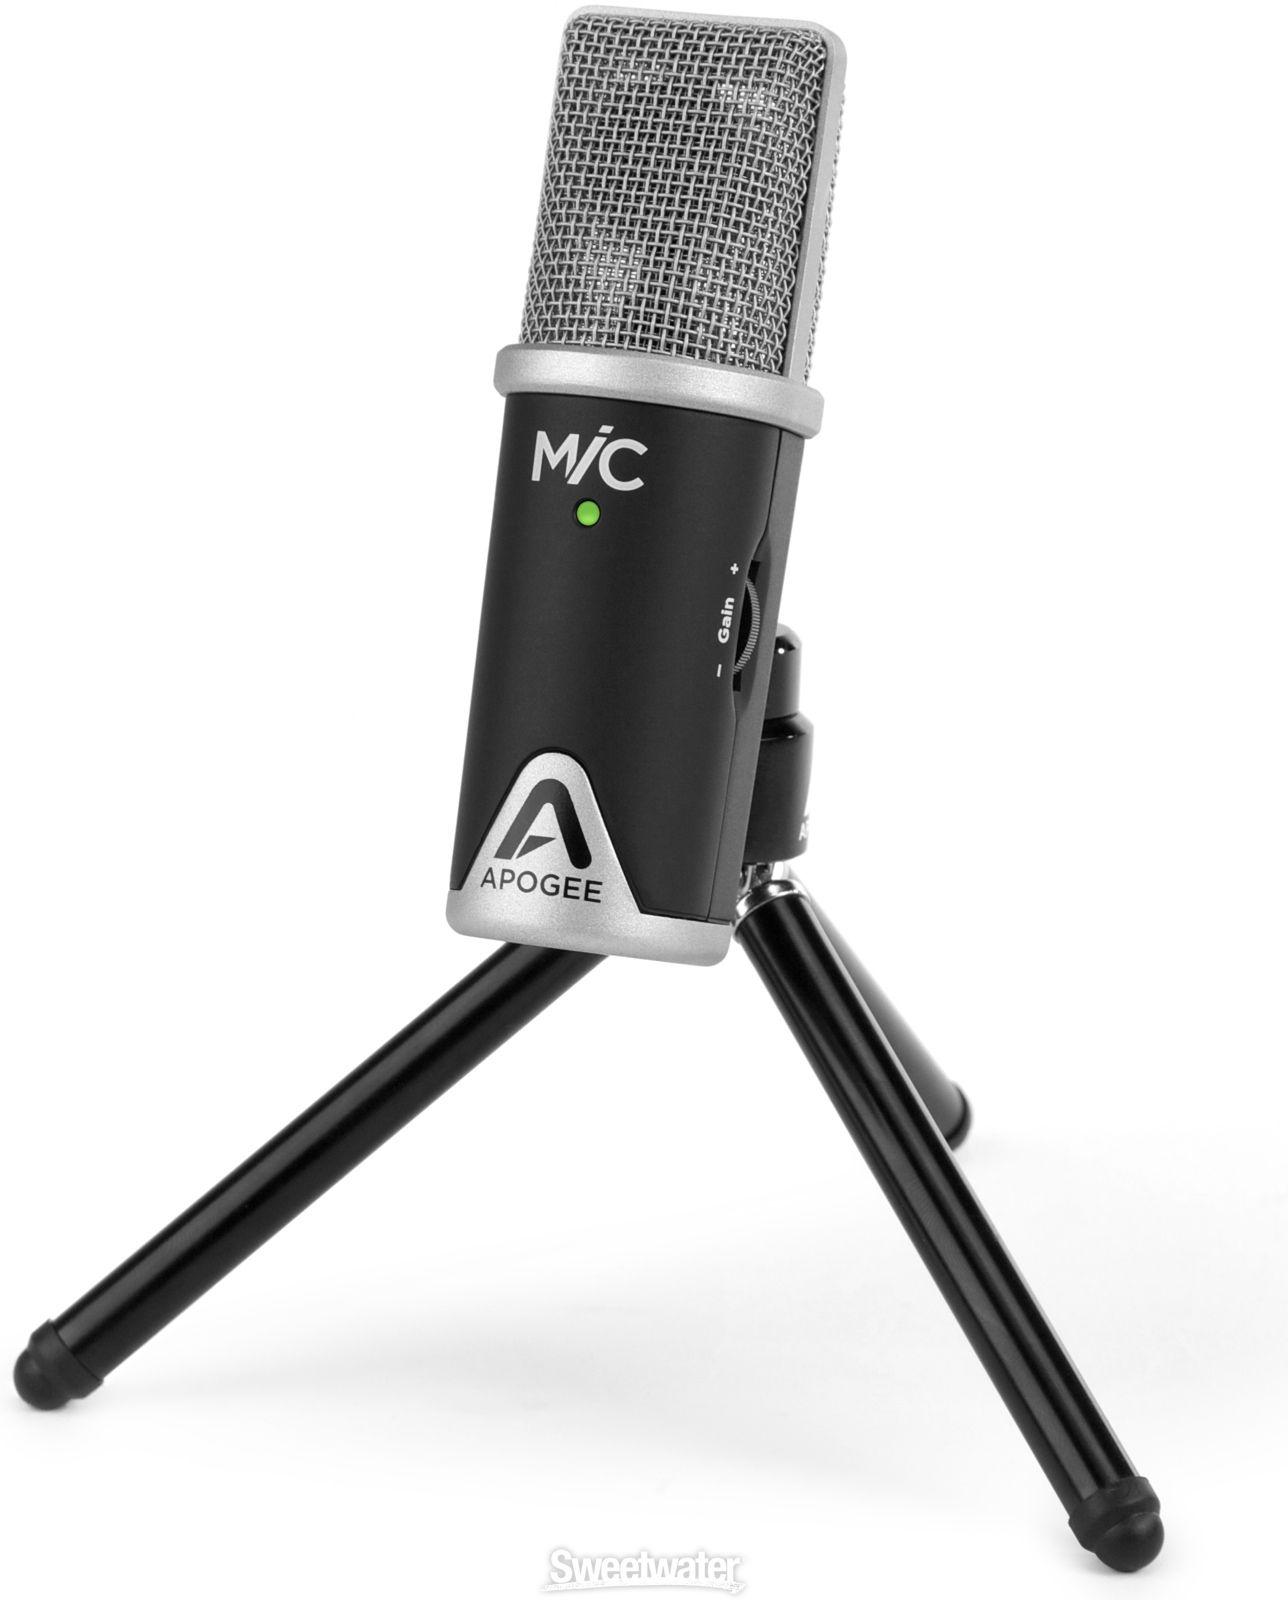 Apogee MiC PLUS for iPad, iPhone, Mac and Windows Usb